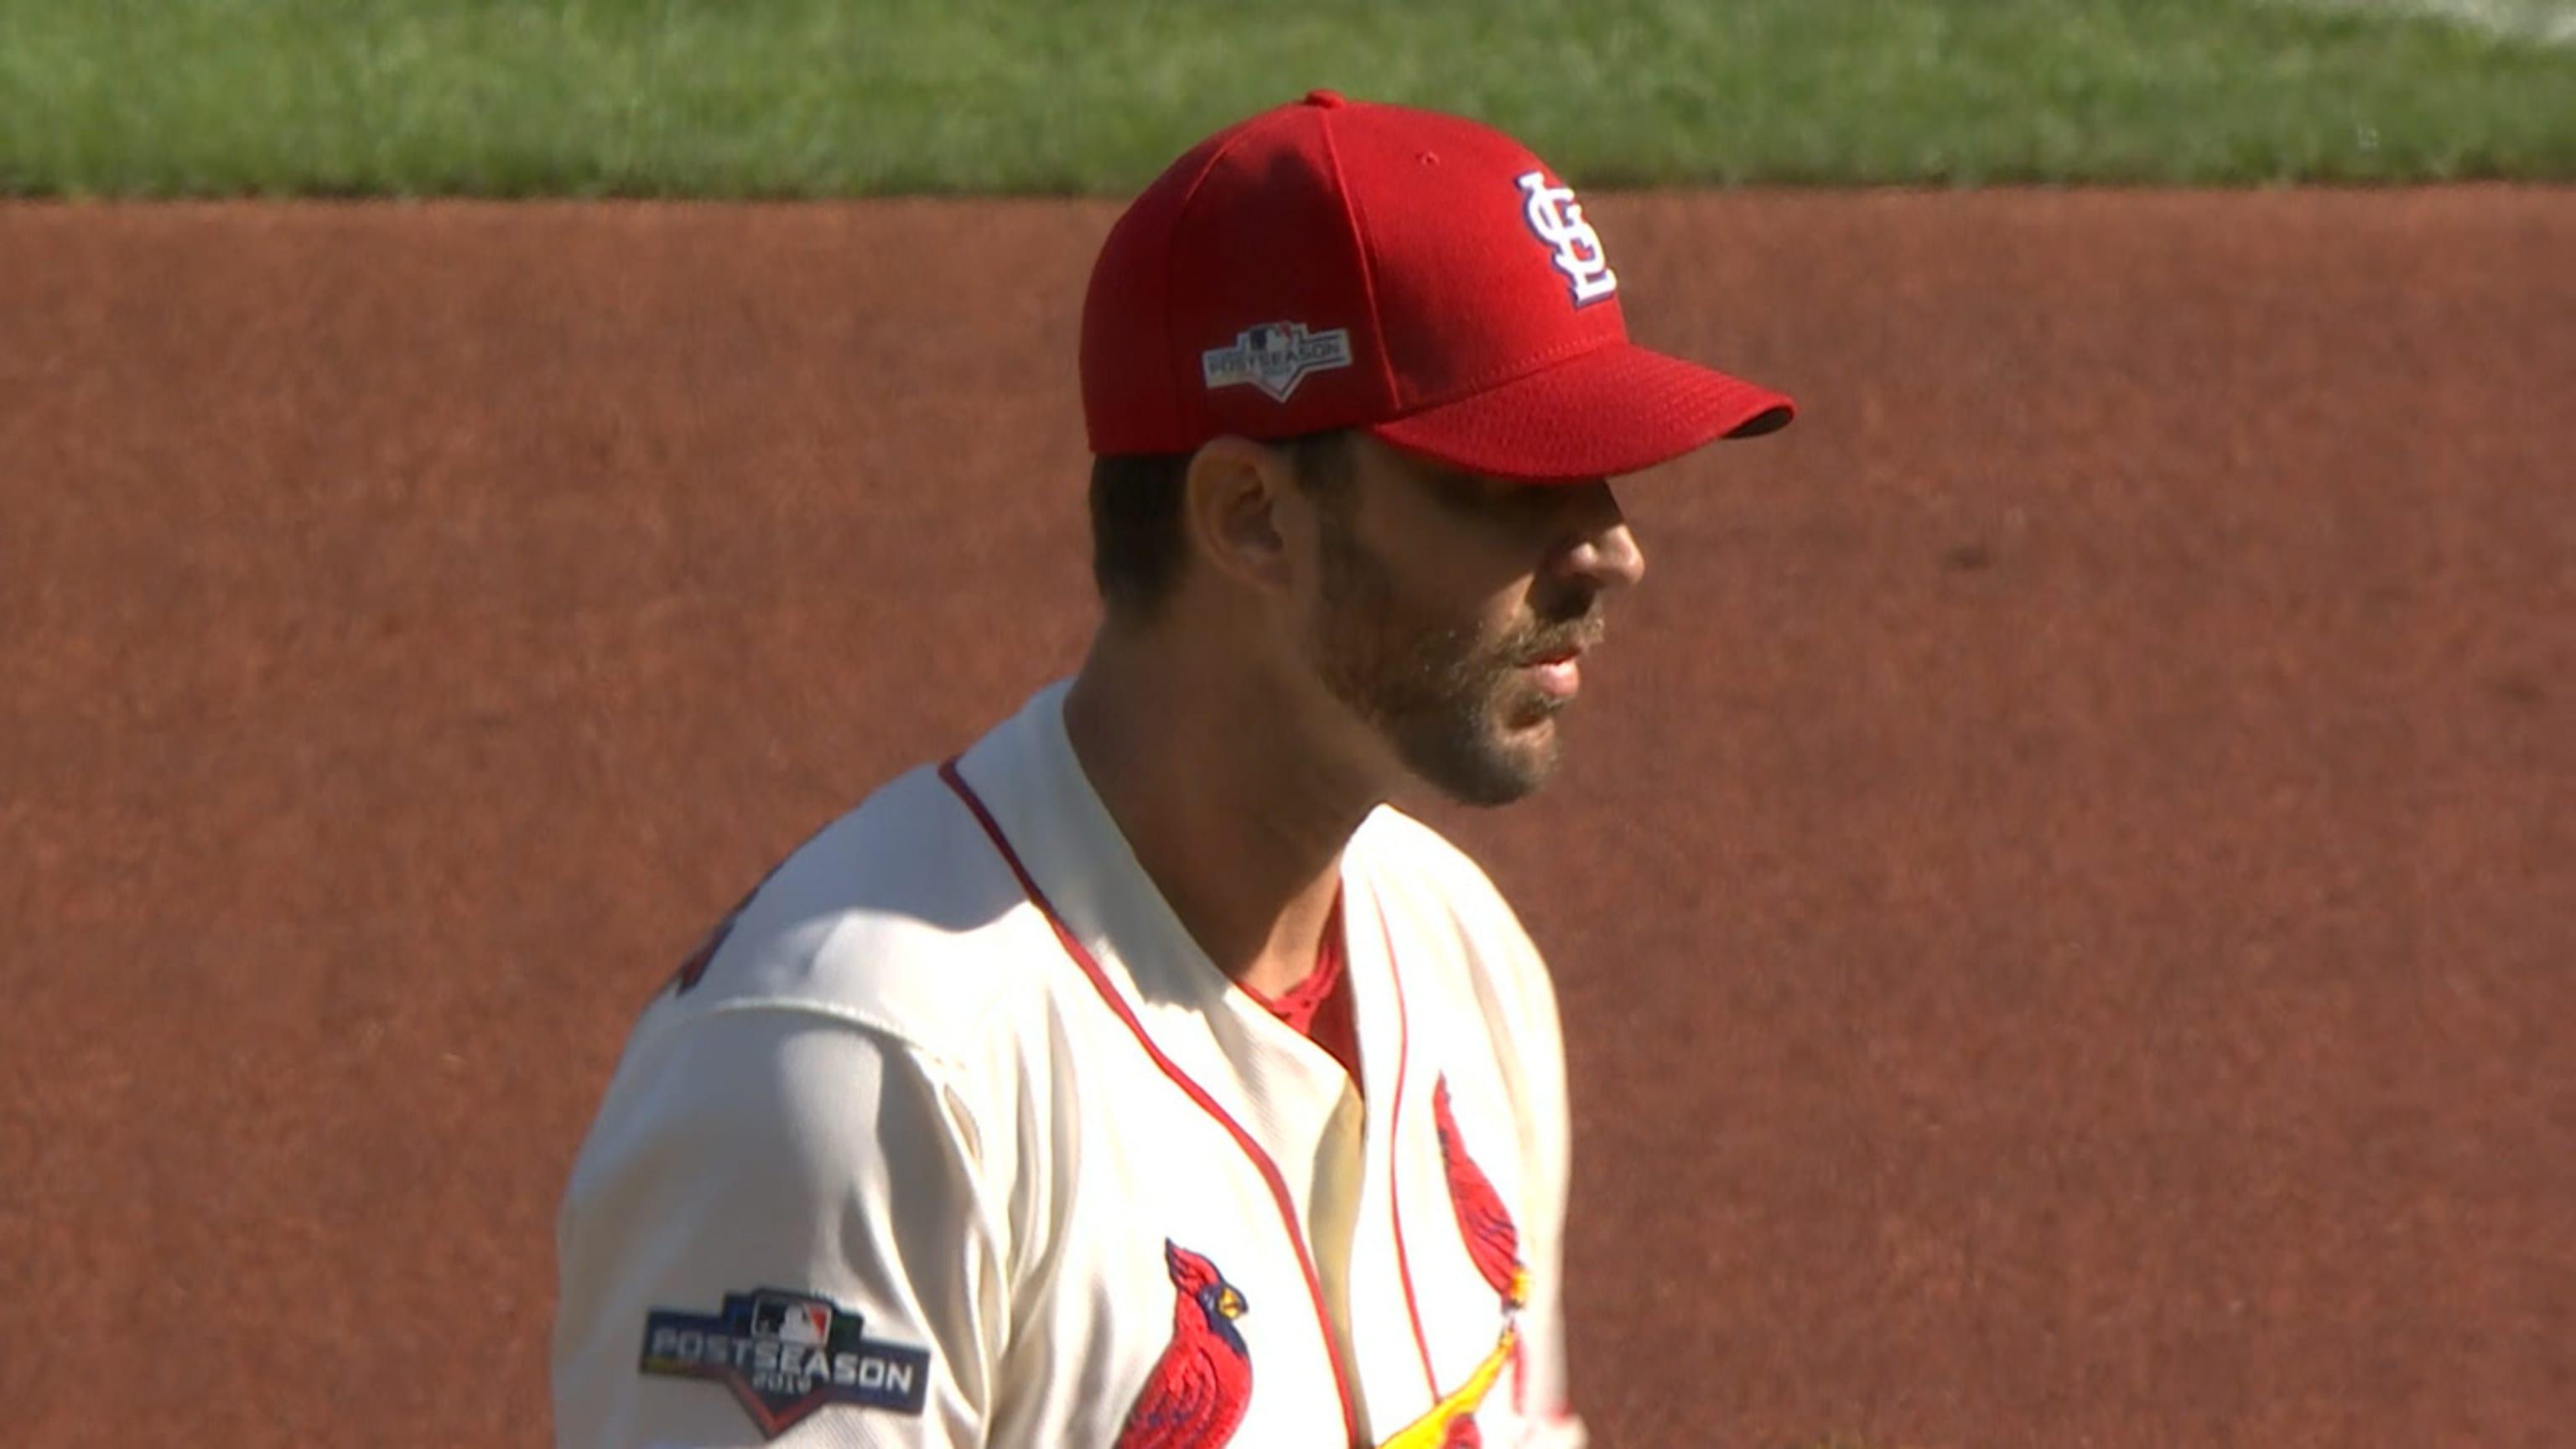 Adam Wainwright St. Louis Cardinals Spring Training Baseball Player Jersey